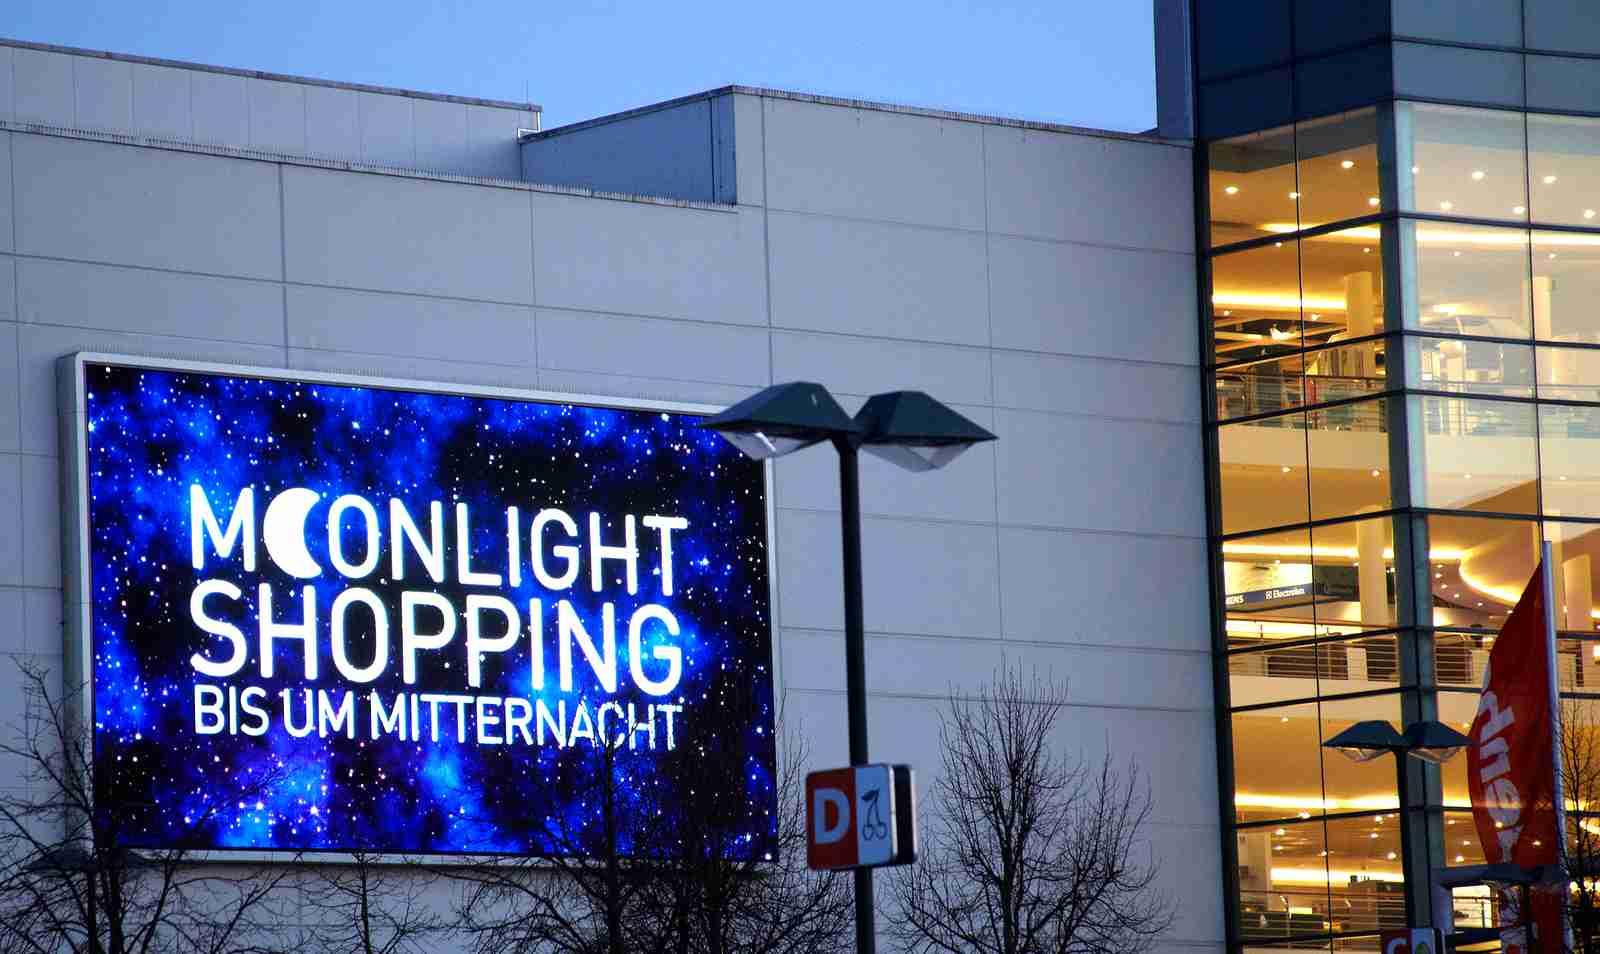 Moonlight-Shopping bei dodenhof Foto: dodenhof